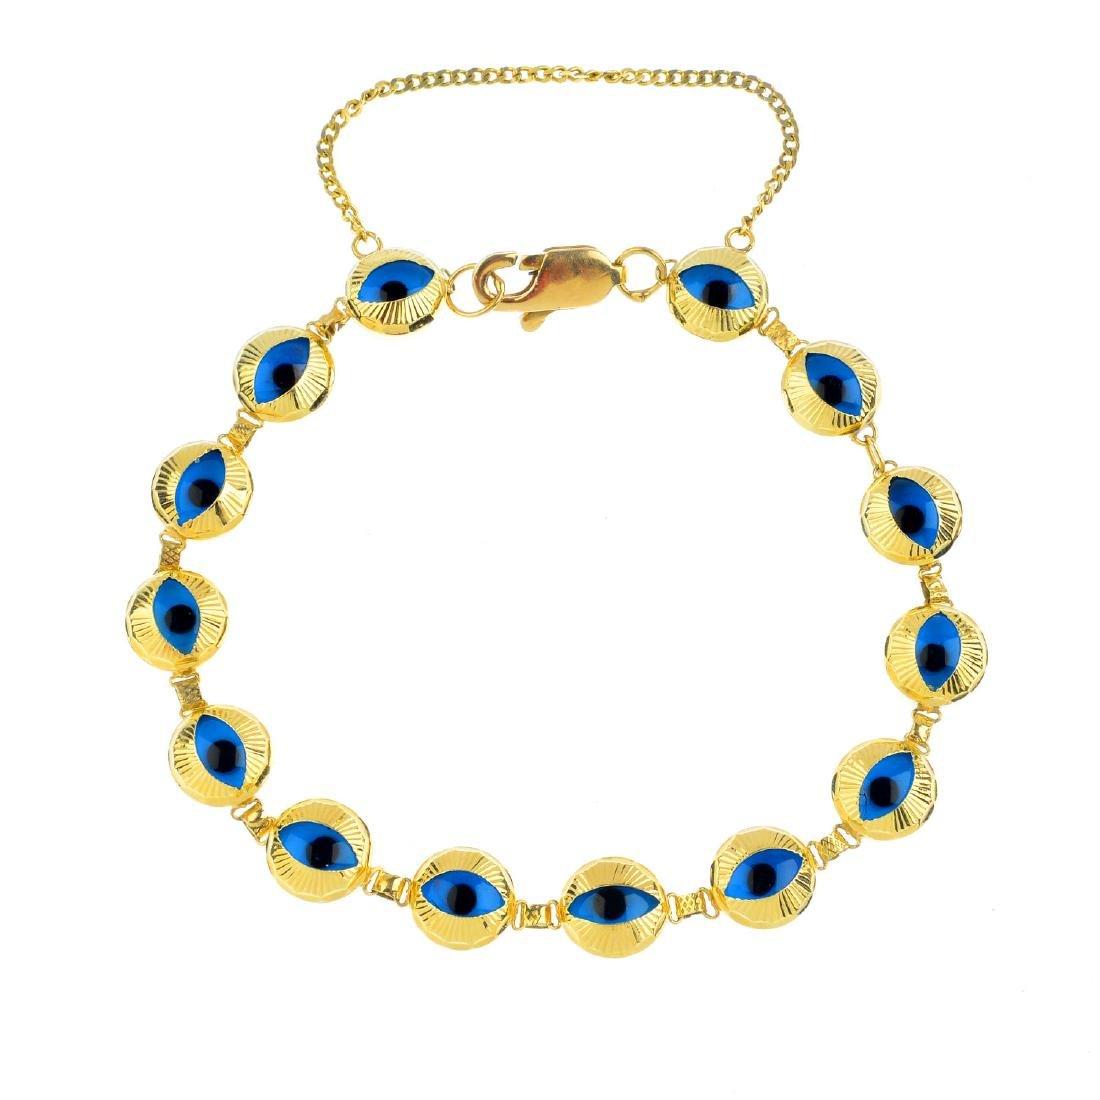 A bracelet. Designed as a series of circular glass